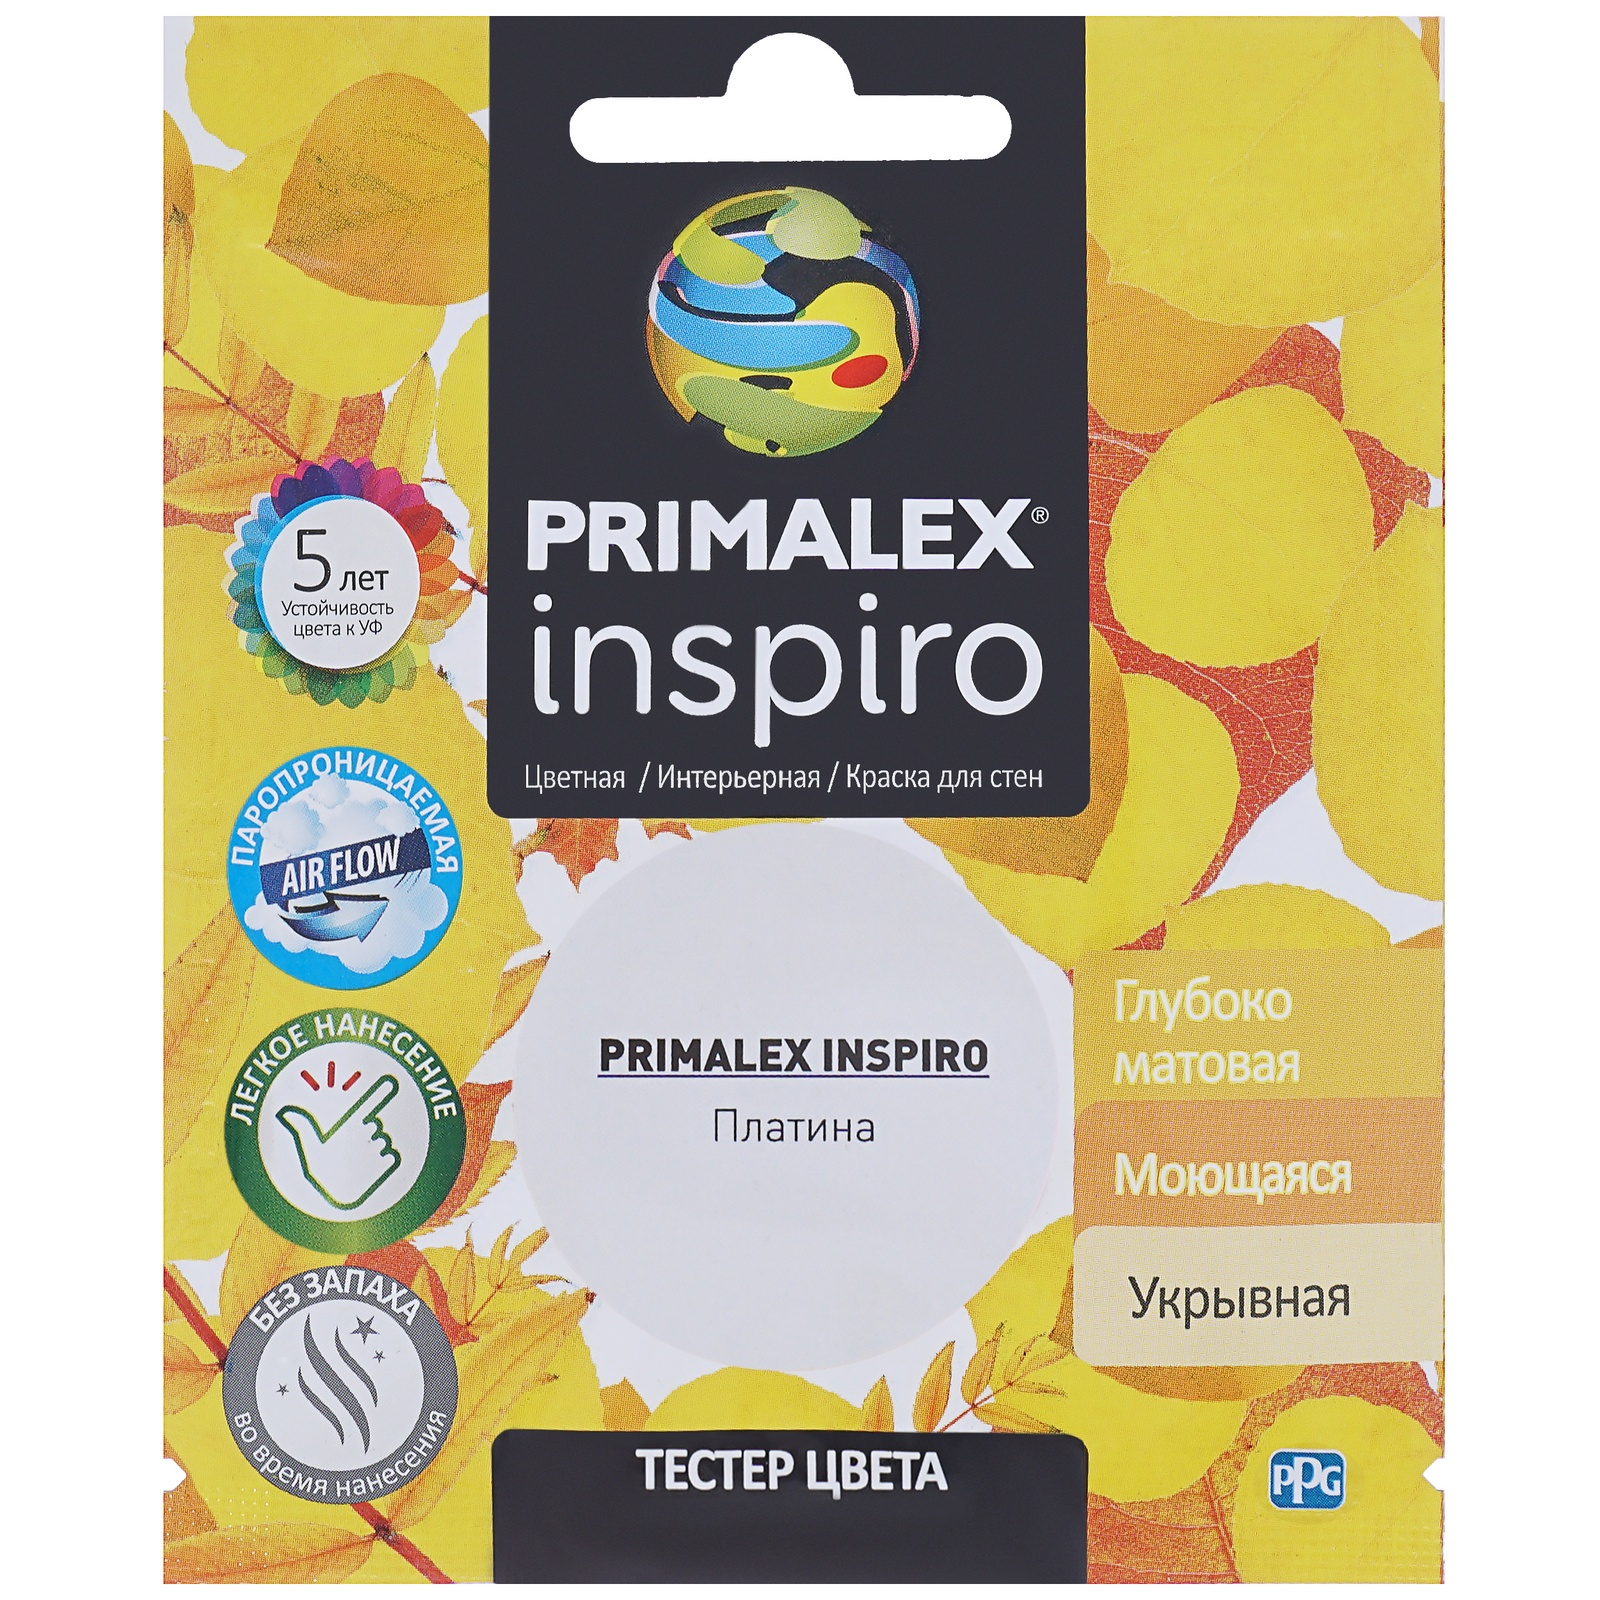 Краска PPG Primalex Inspiro Платина 40мл краска ppg primalex inspiro красный мак 40мл pmx i47